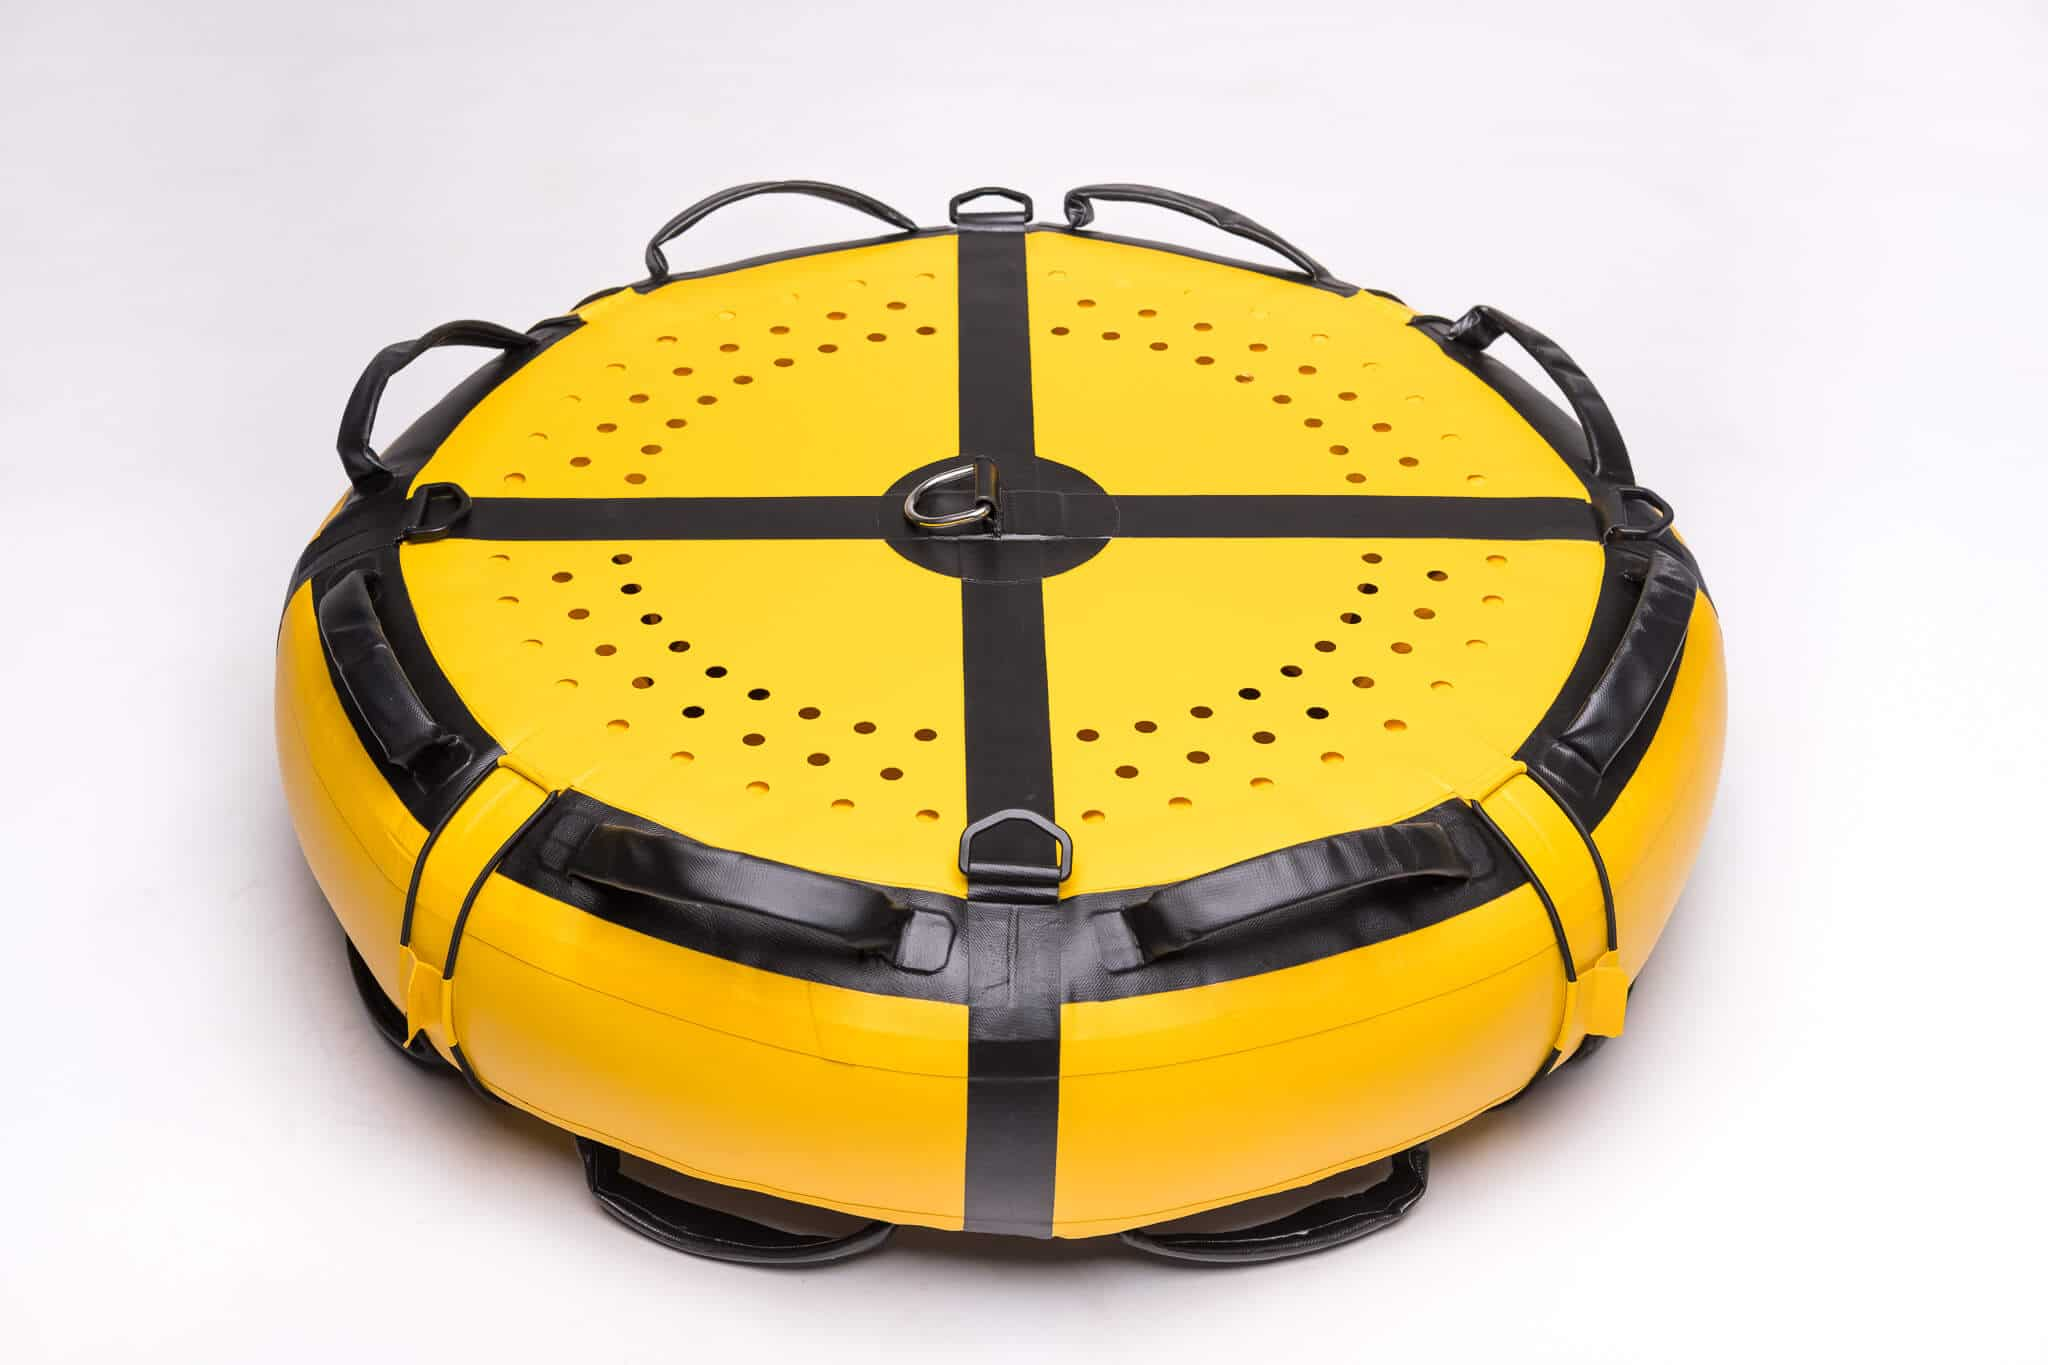 2bfree Freediving Buoy